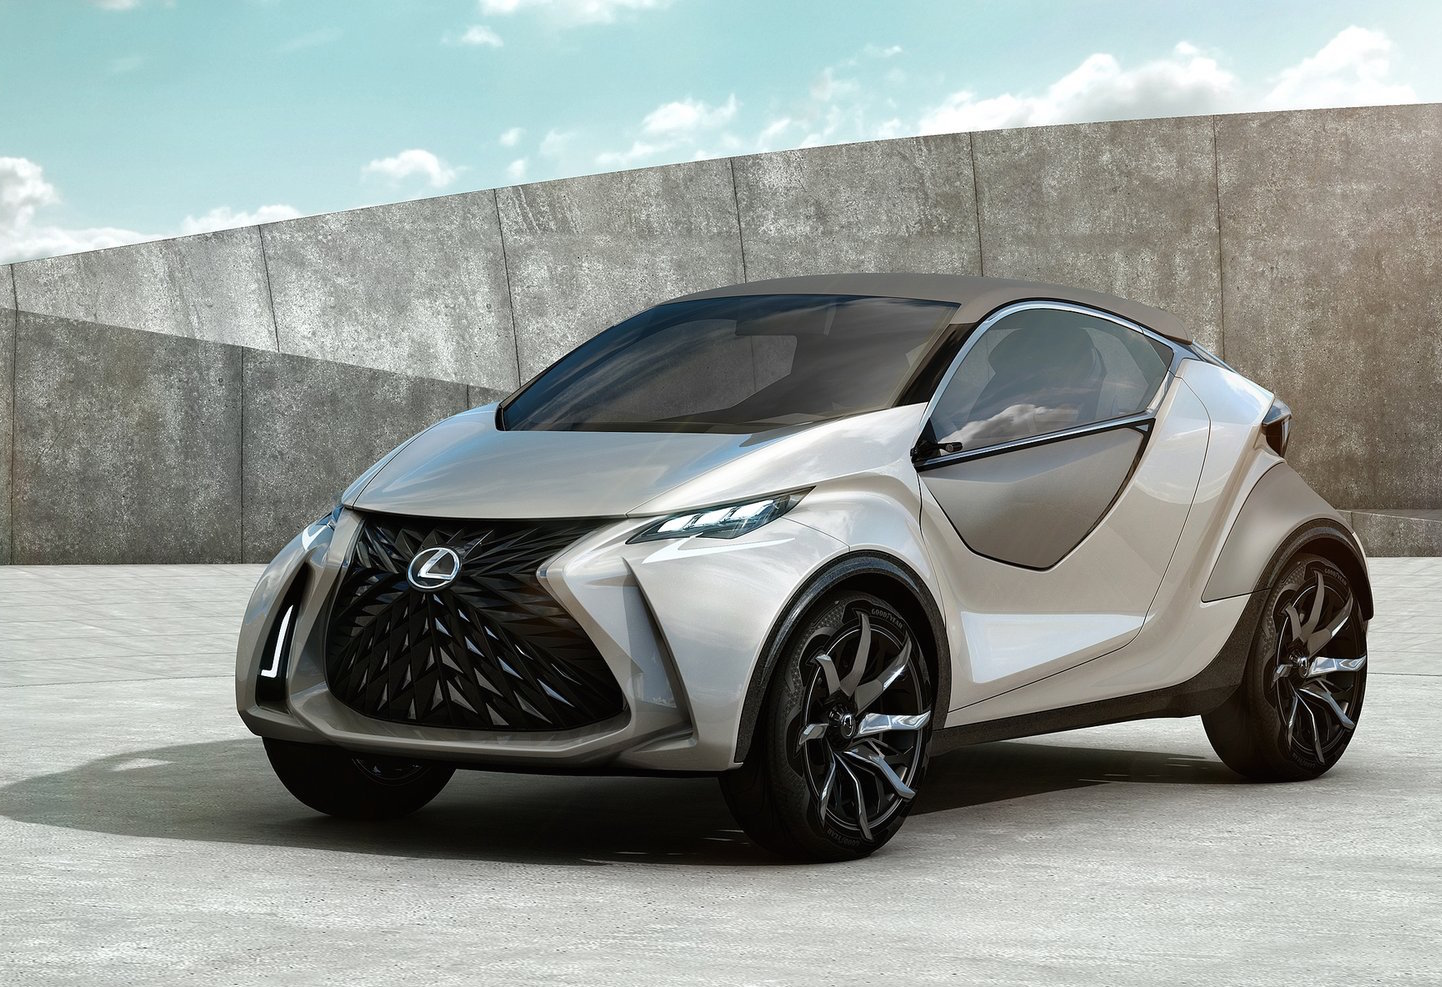 lexus planning new city car, inspiredlf-sa concept